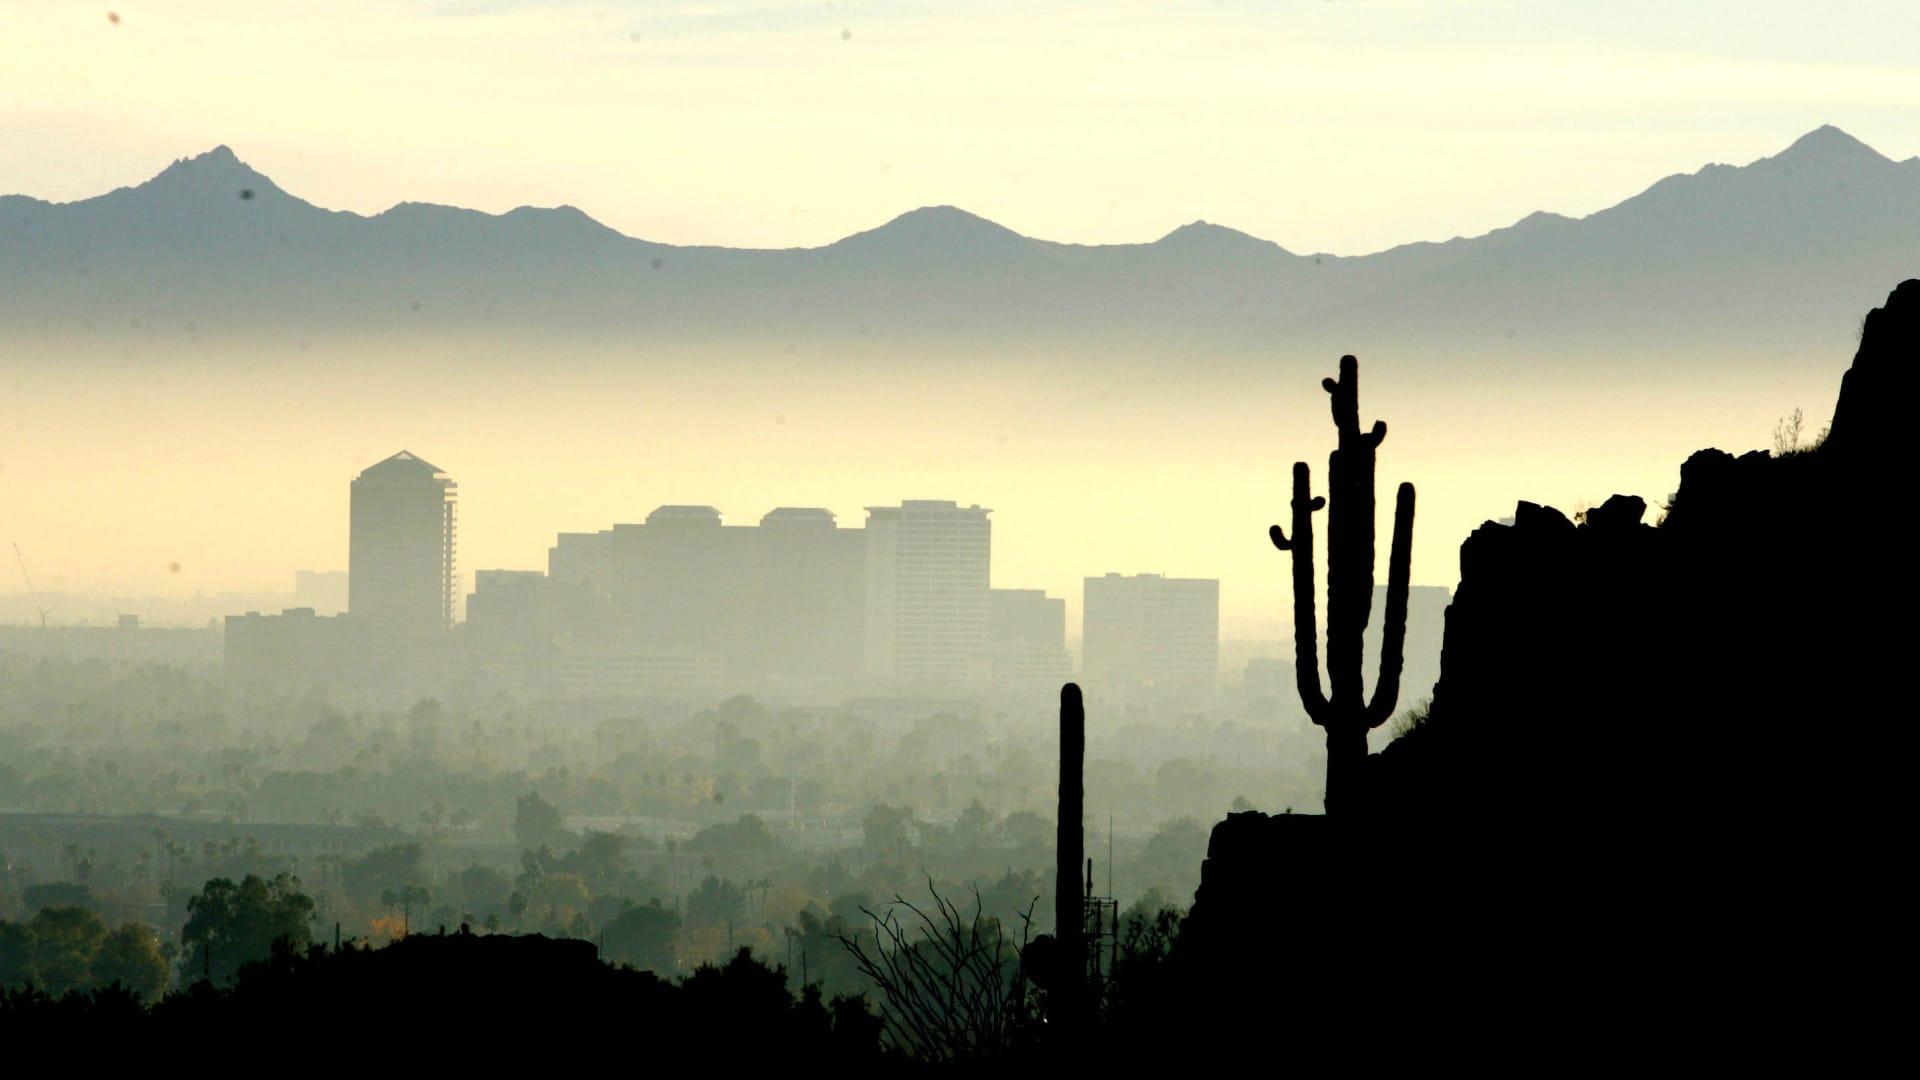 Smog and haze obscure the Phoenix, Ariz. skyline from Piestewa Peak.